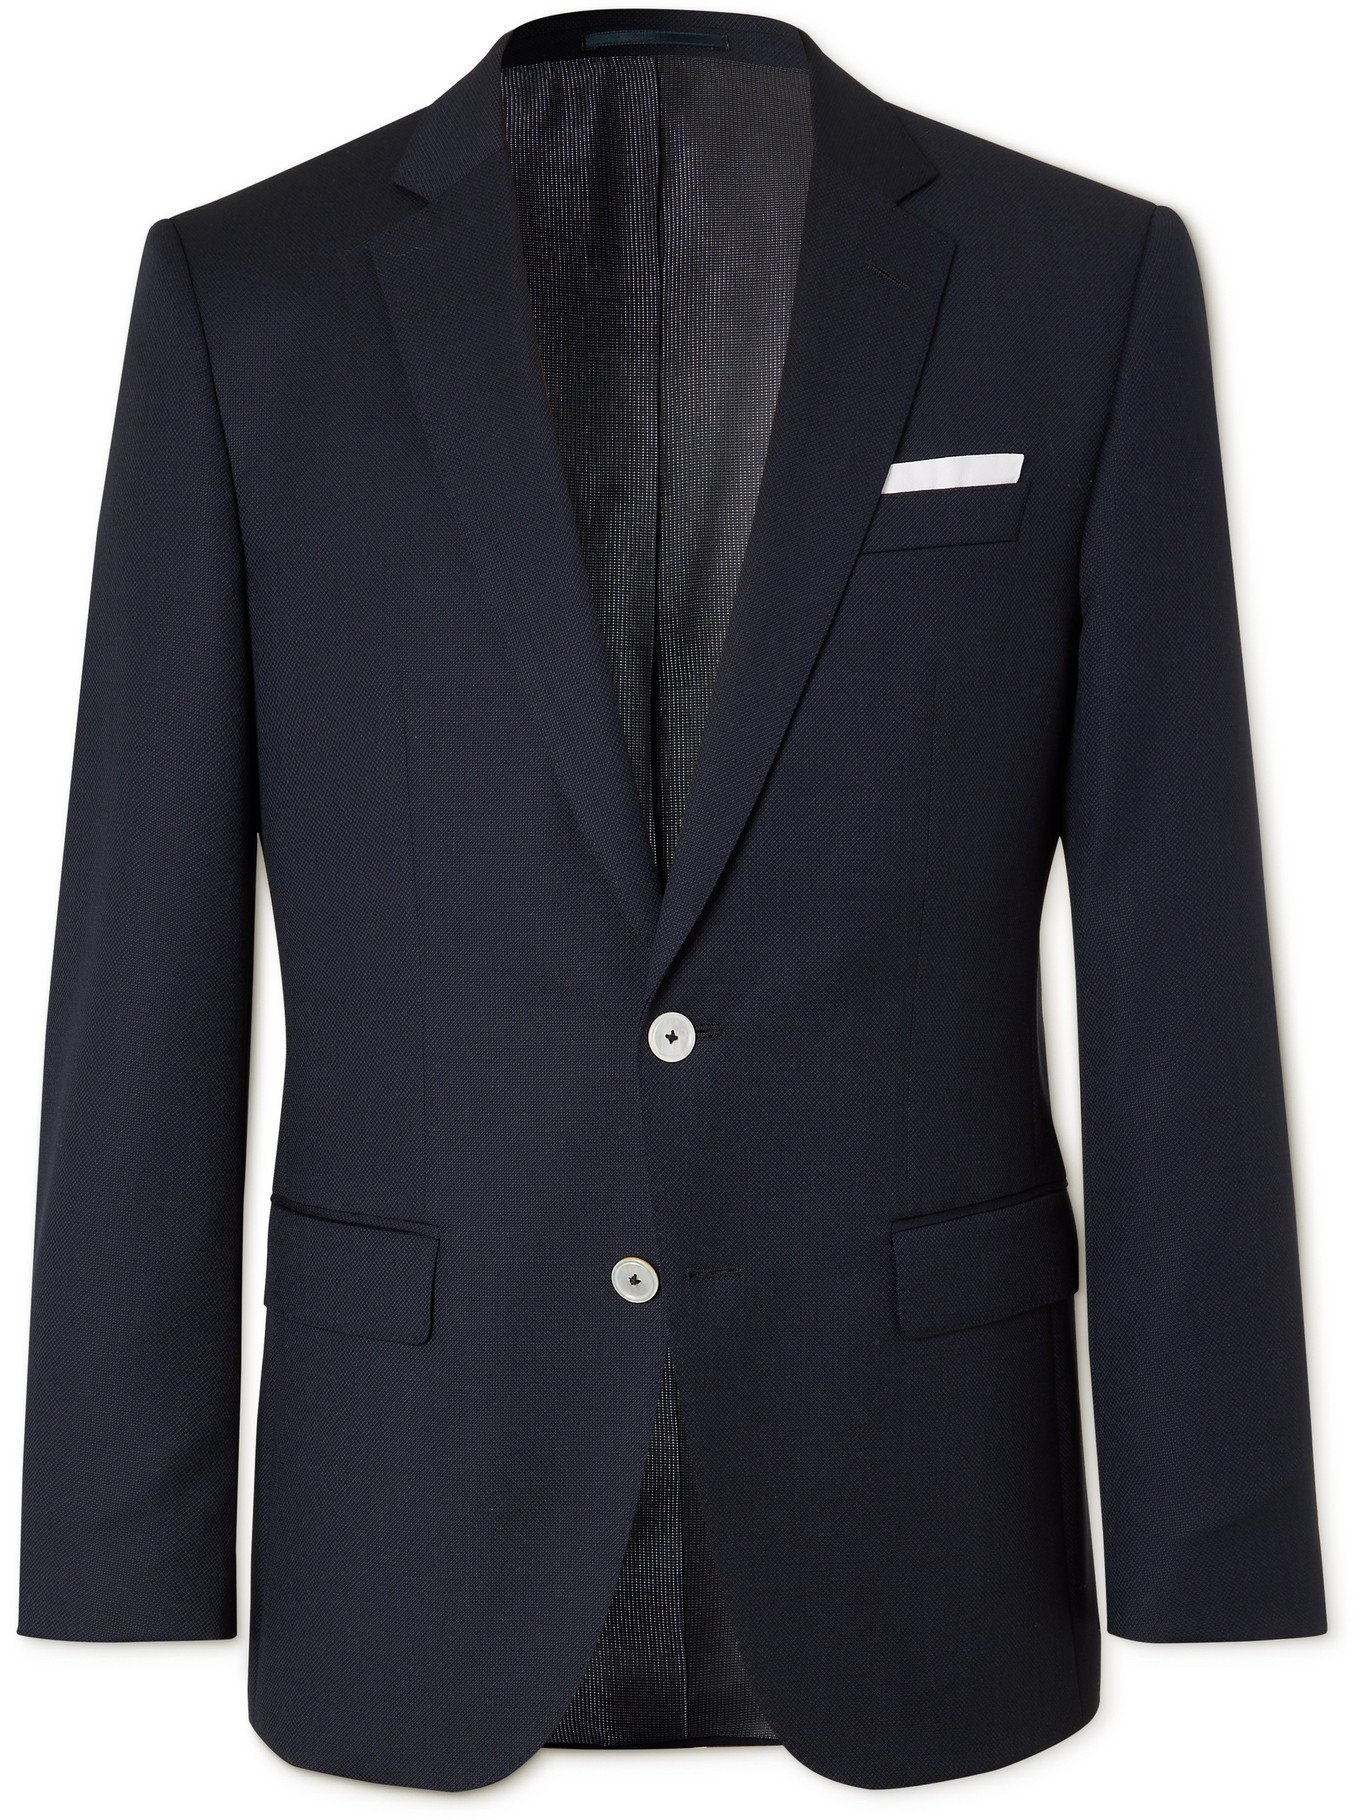 HUGO BOSS - Slim-Fit Virgin Wool Blazer - Blue